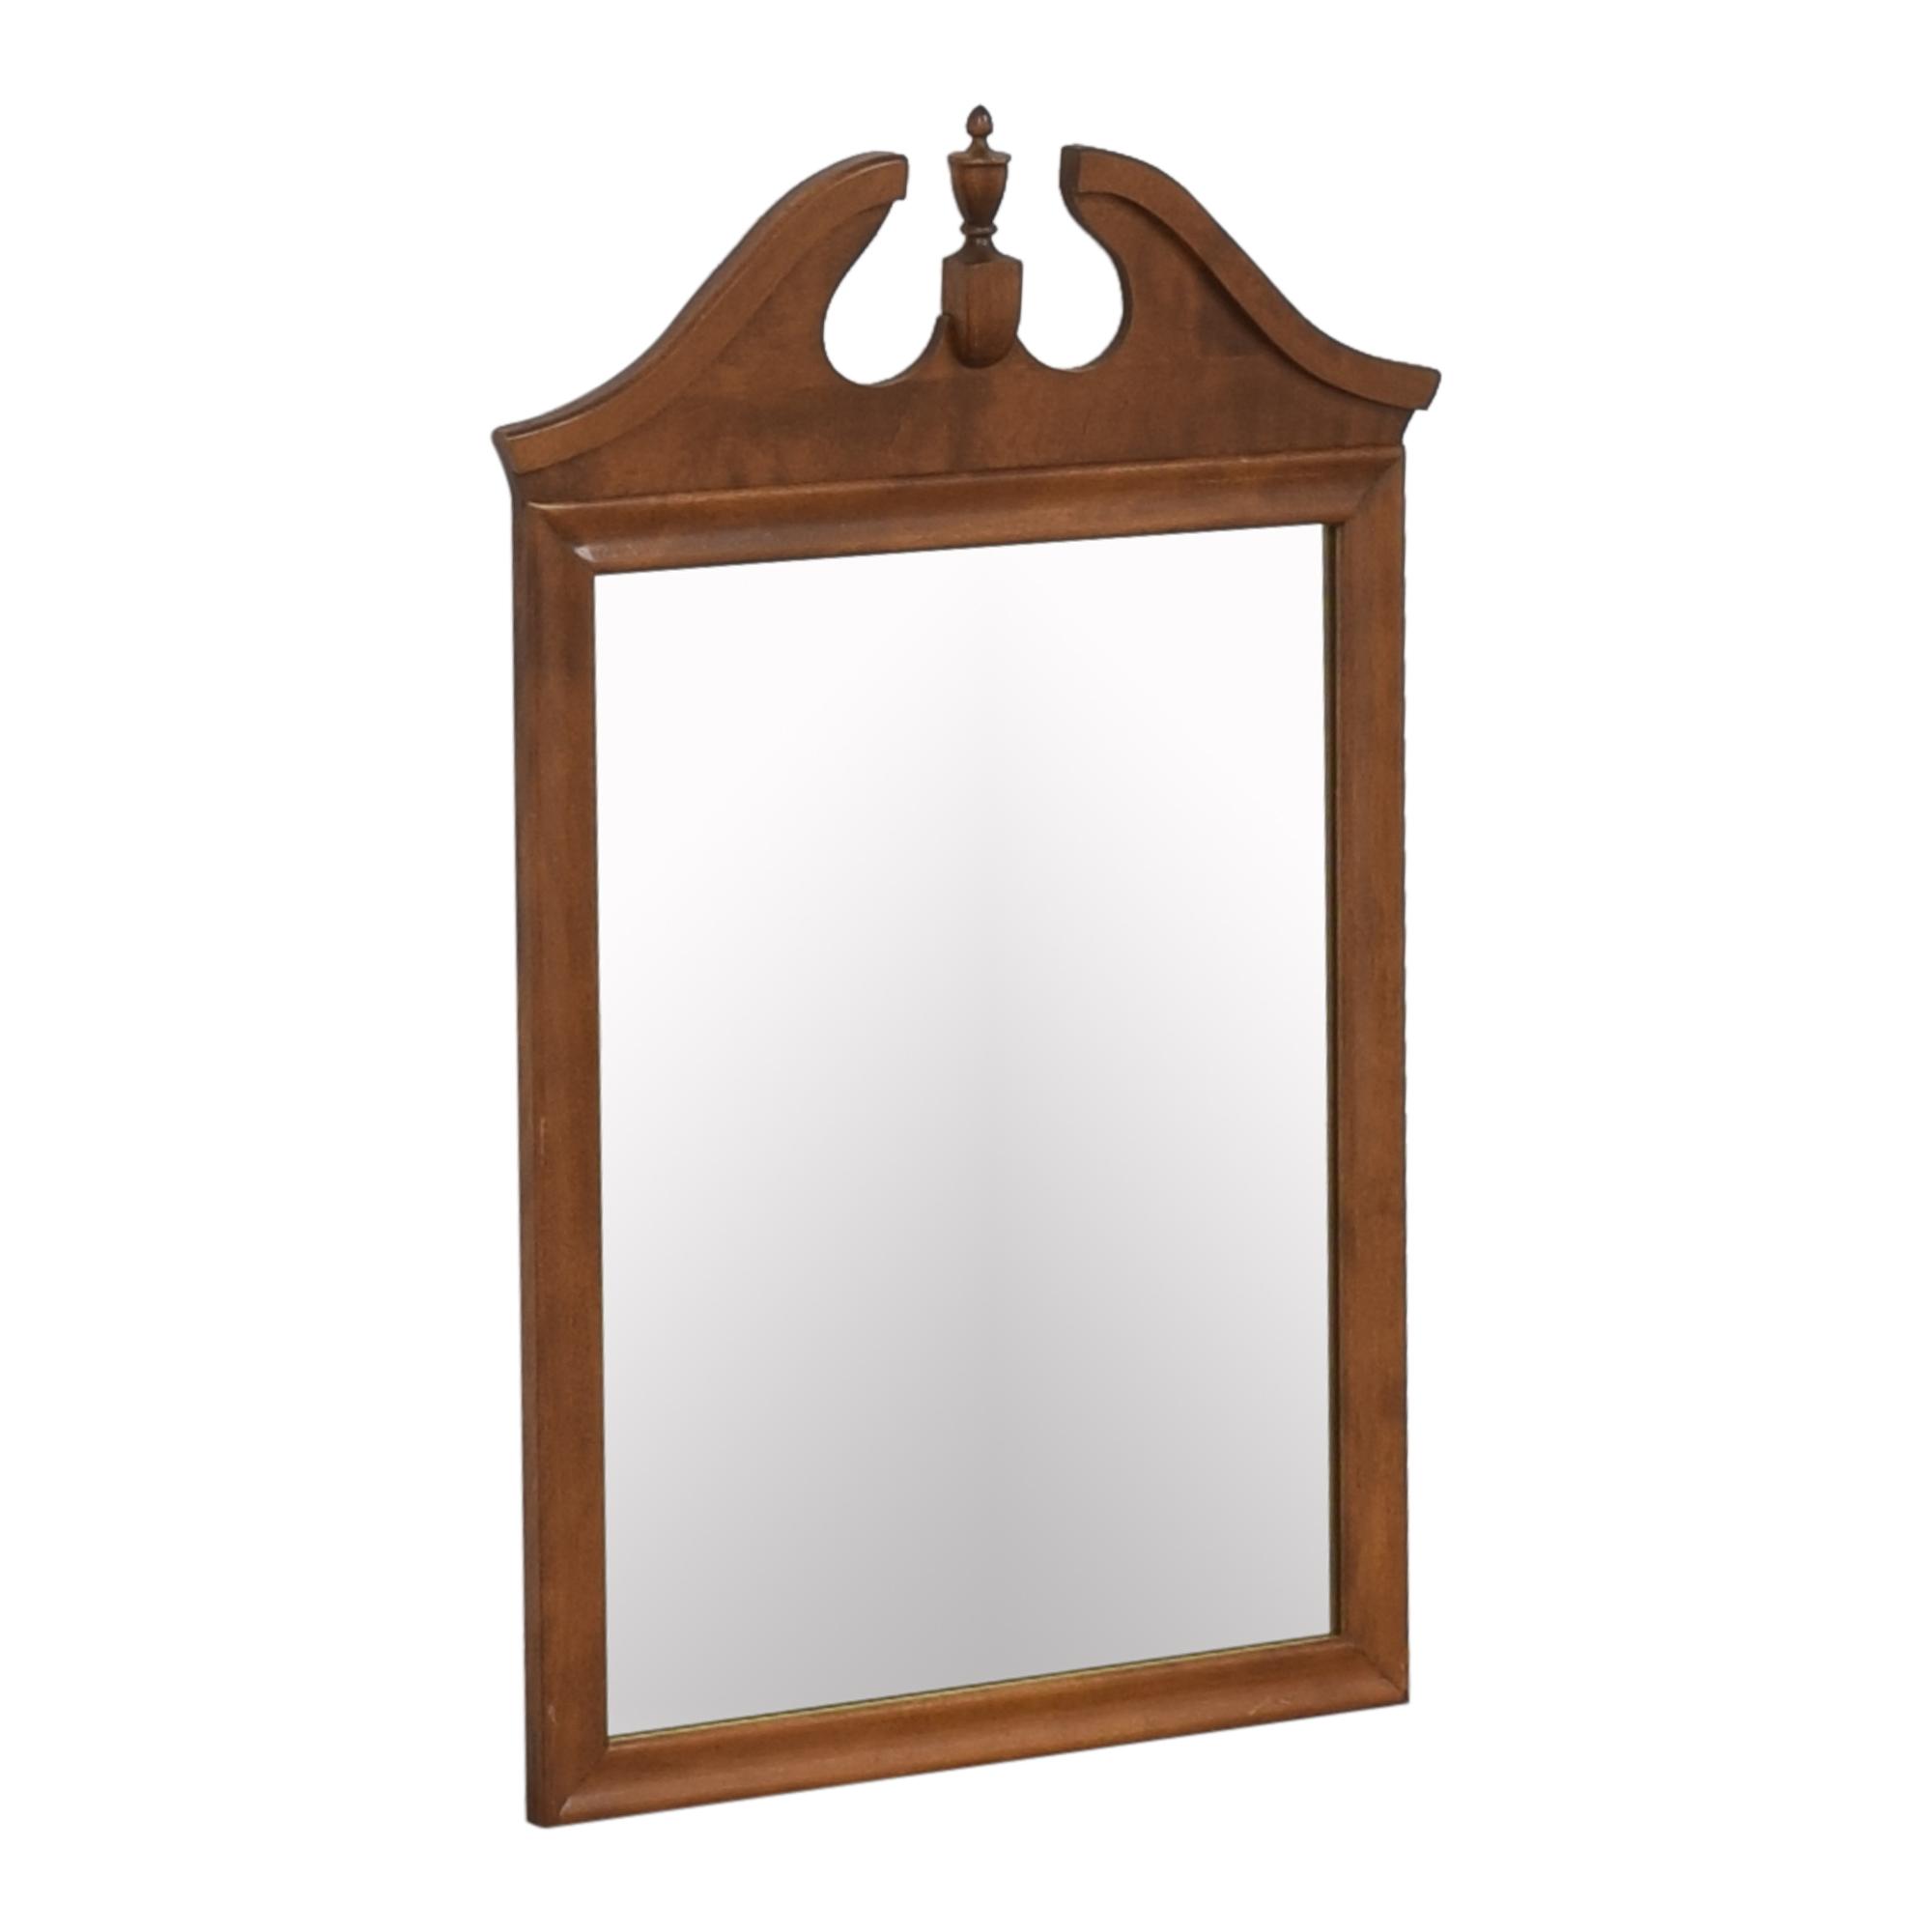 Ethan Allen Ethan Allen Framed Wall Mirror ma